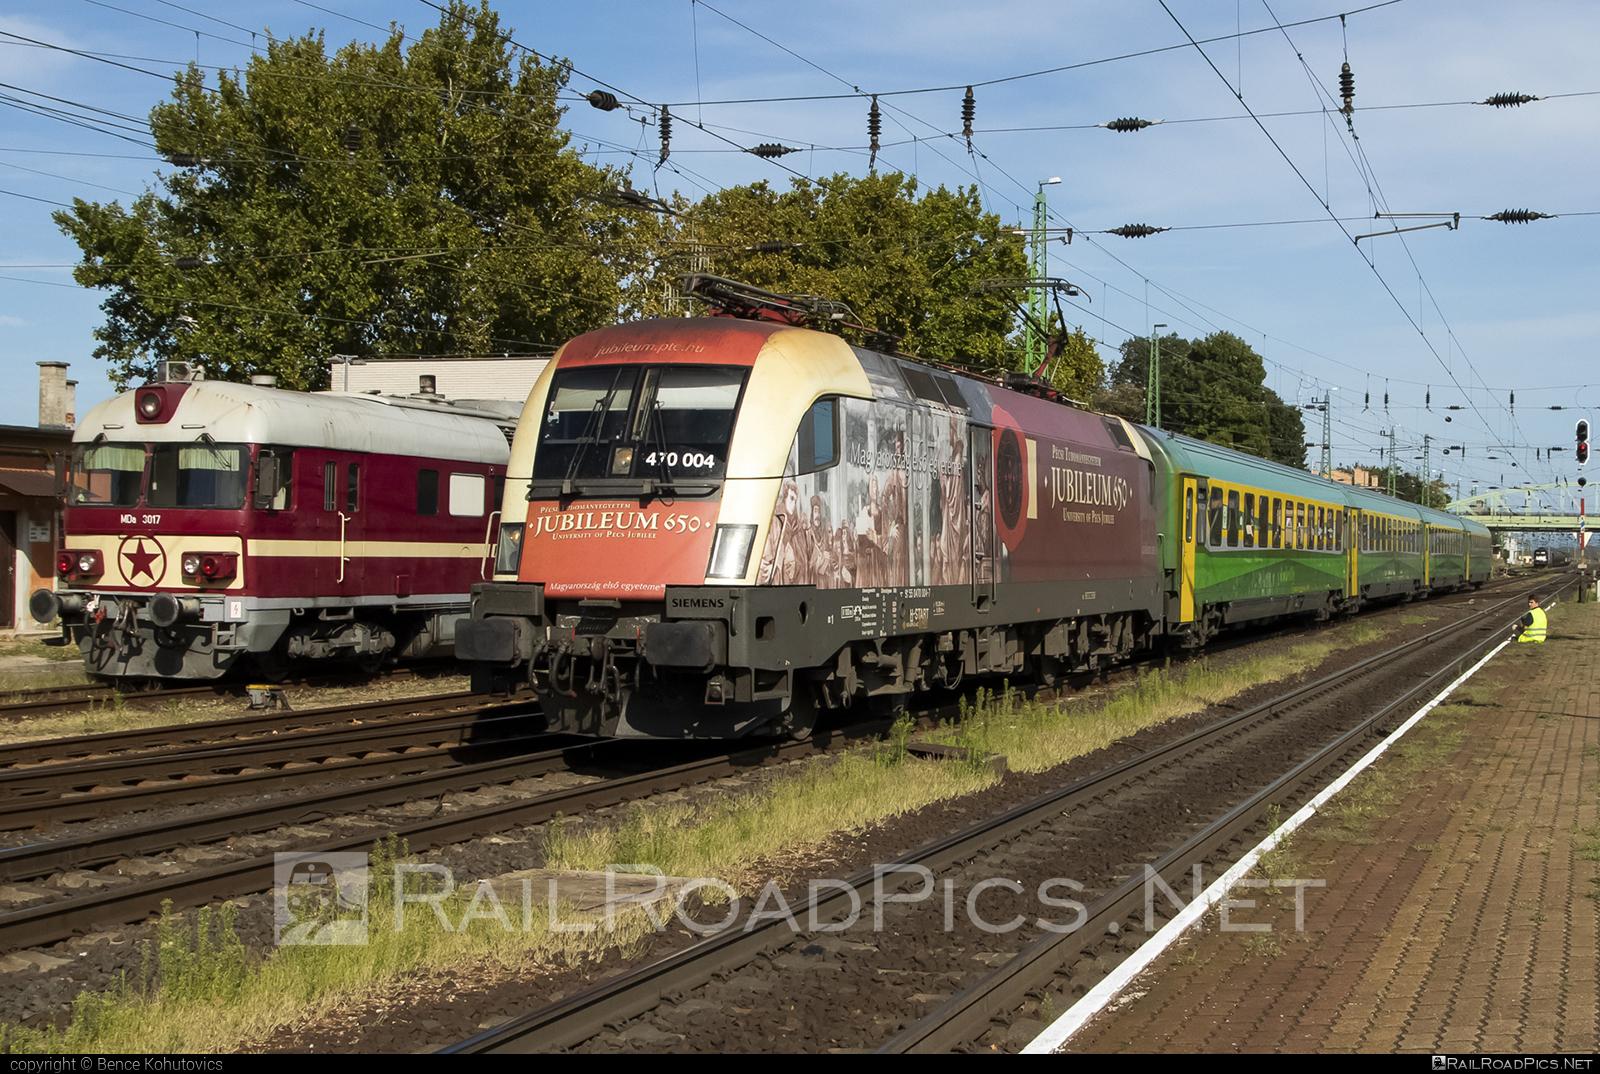 Siemens ES 64 U2 - 470 004 operated by MÁV-START ZRt. #es64 #es64u #es64u2 #eurosprinter #mav #mavstart #mavstartzrt #siemens #siemenses64 #siemenses64u #siemenses64u2 #siemenstaurus #taurus #tauruslocomotive